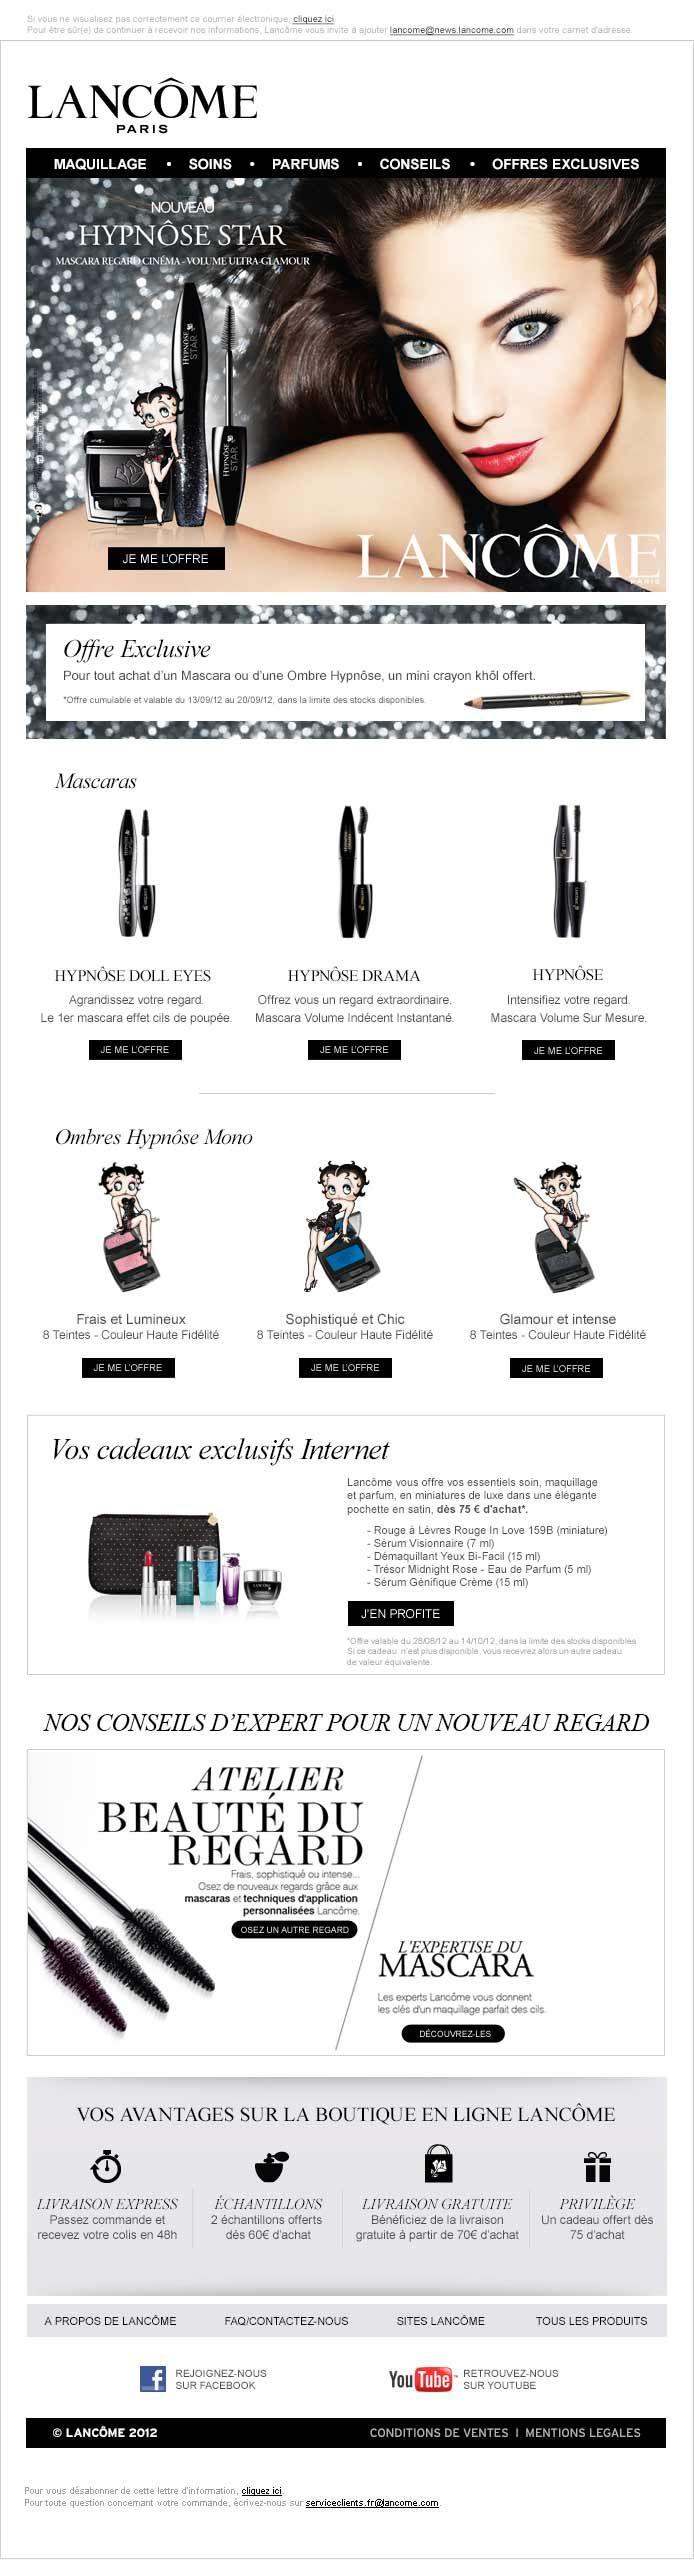 Lancôme Paris - Webdesign